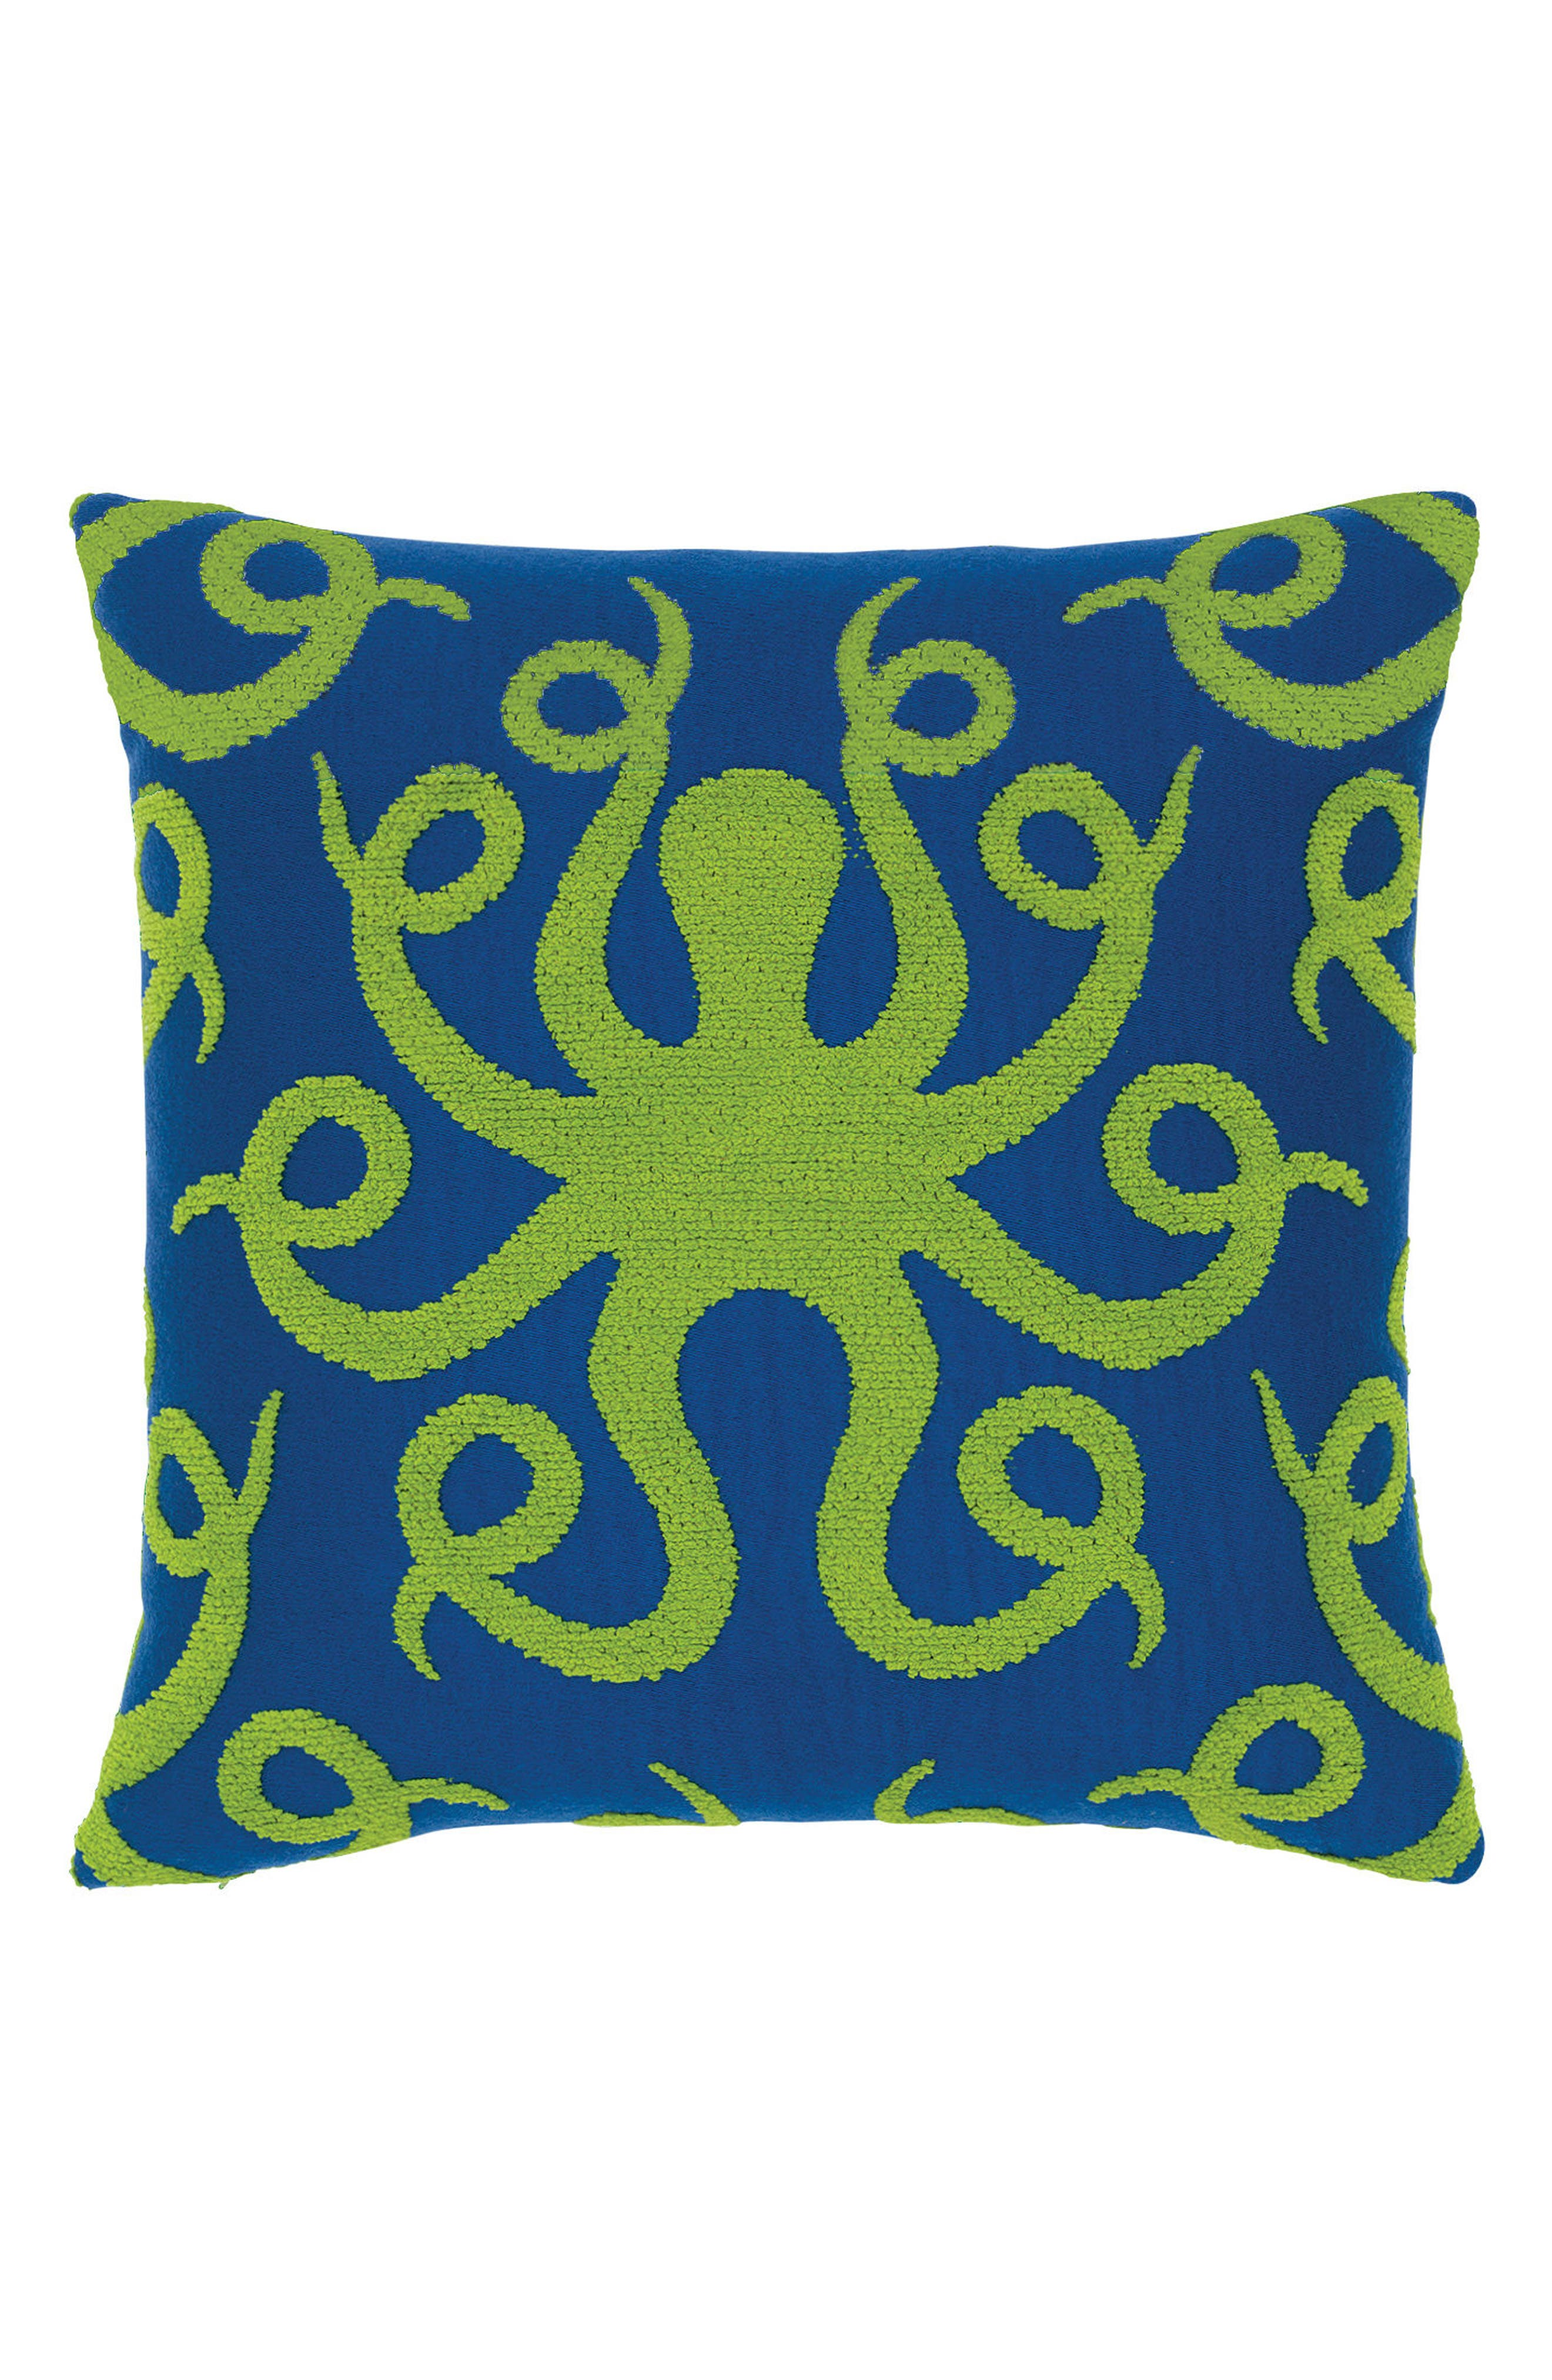 Octoplush Indoor/Outdoor Accent Pillow,                             Main thumbnail 1, color,                             GREEN/ BLUE